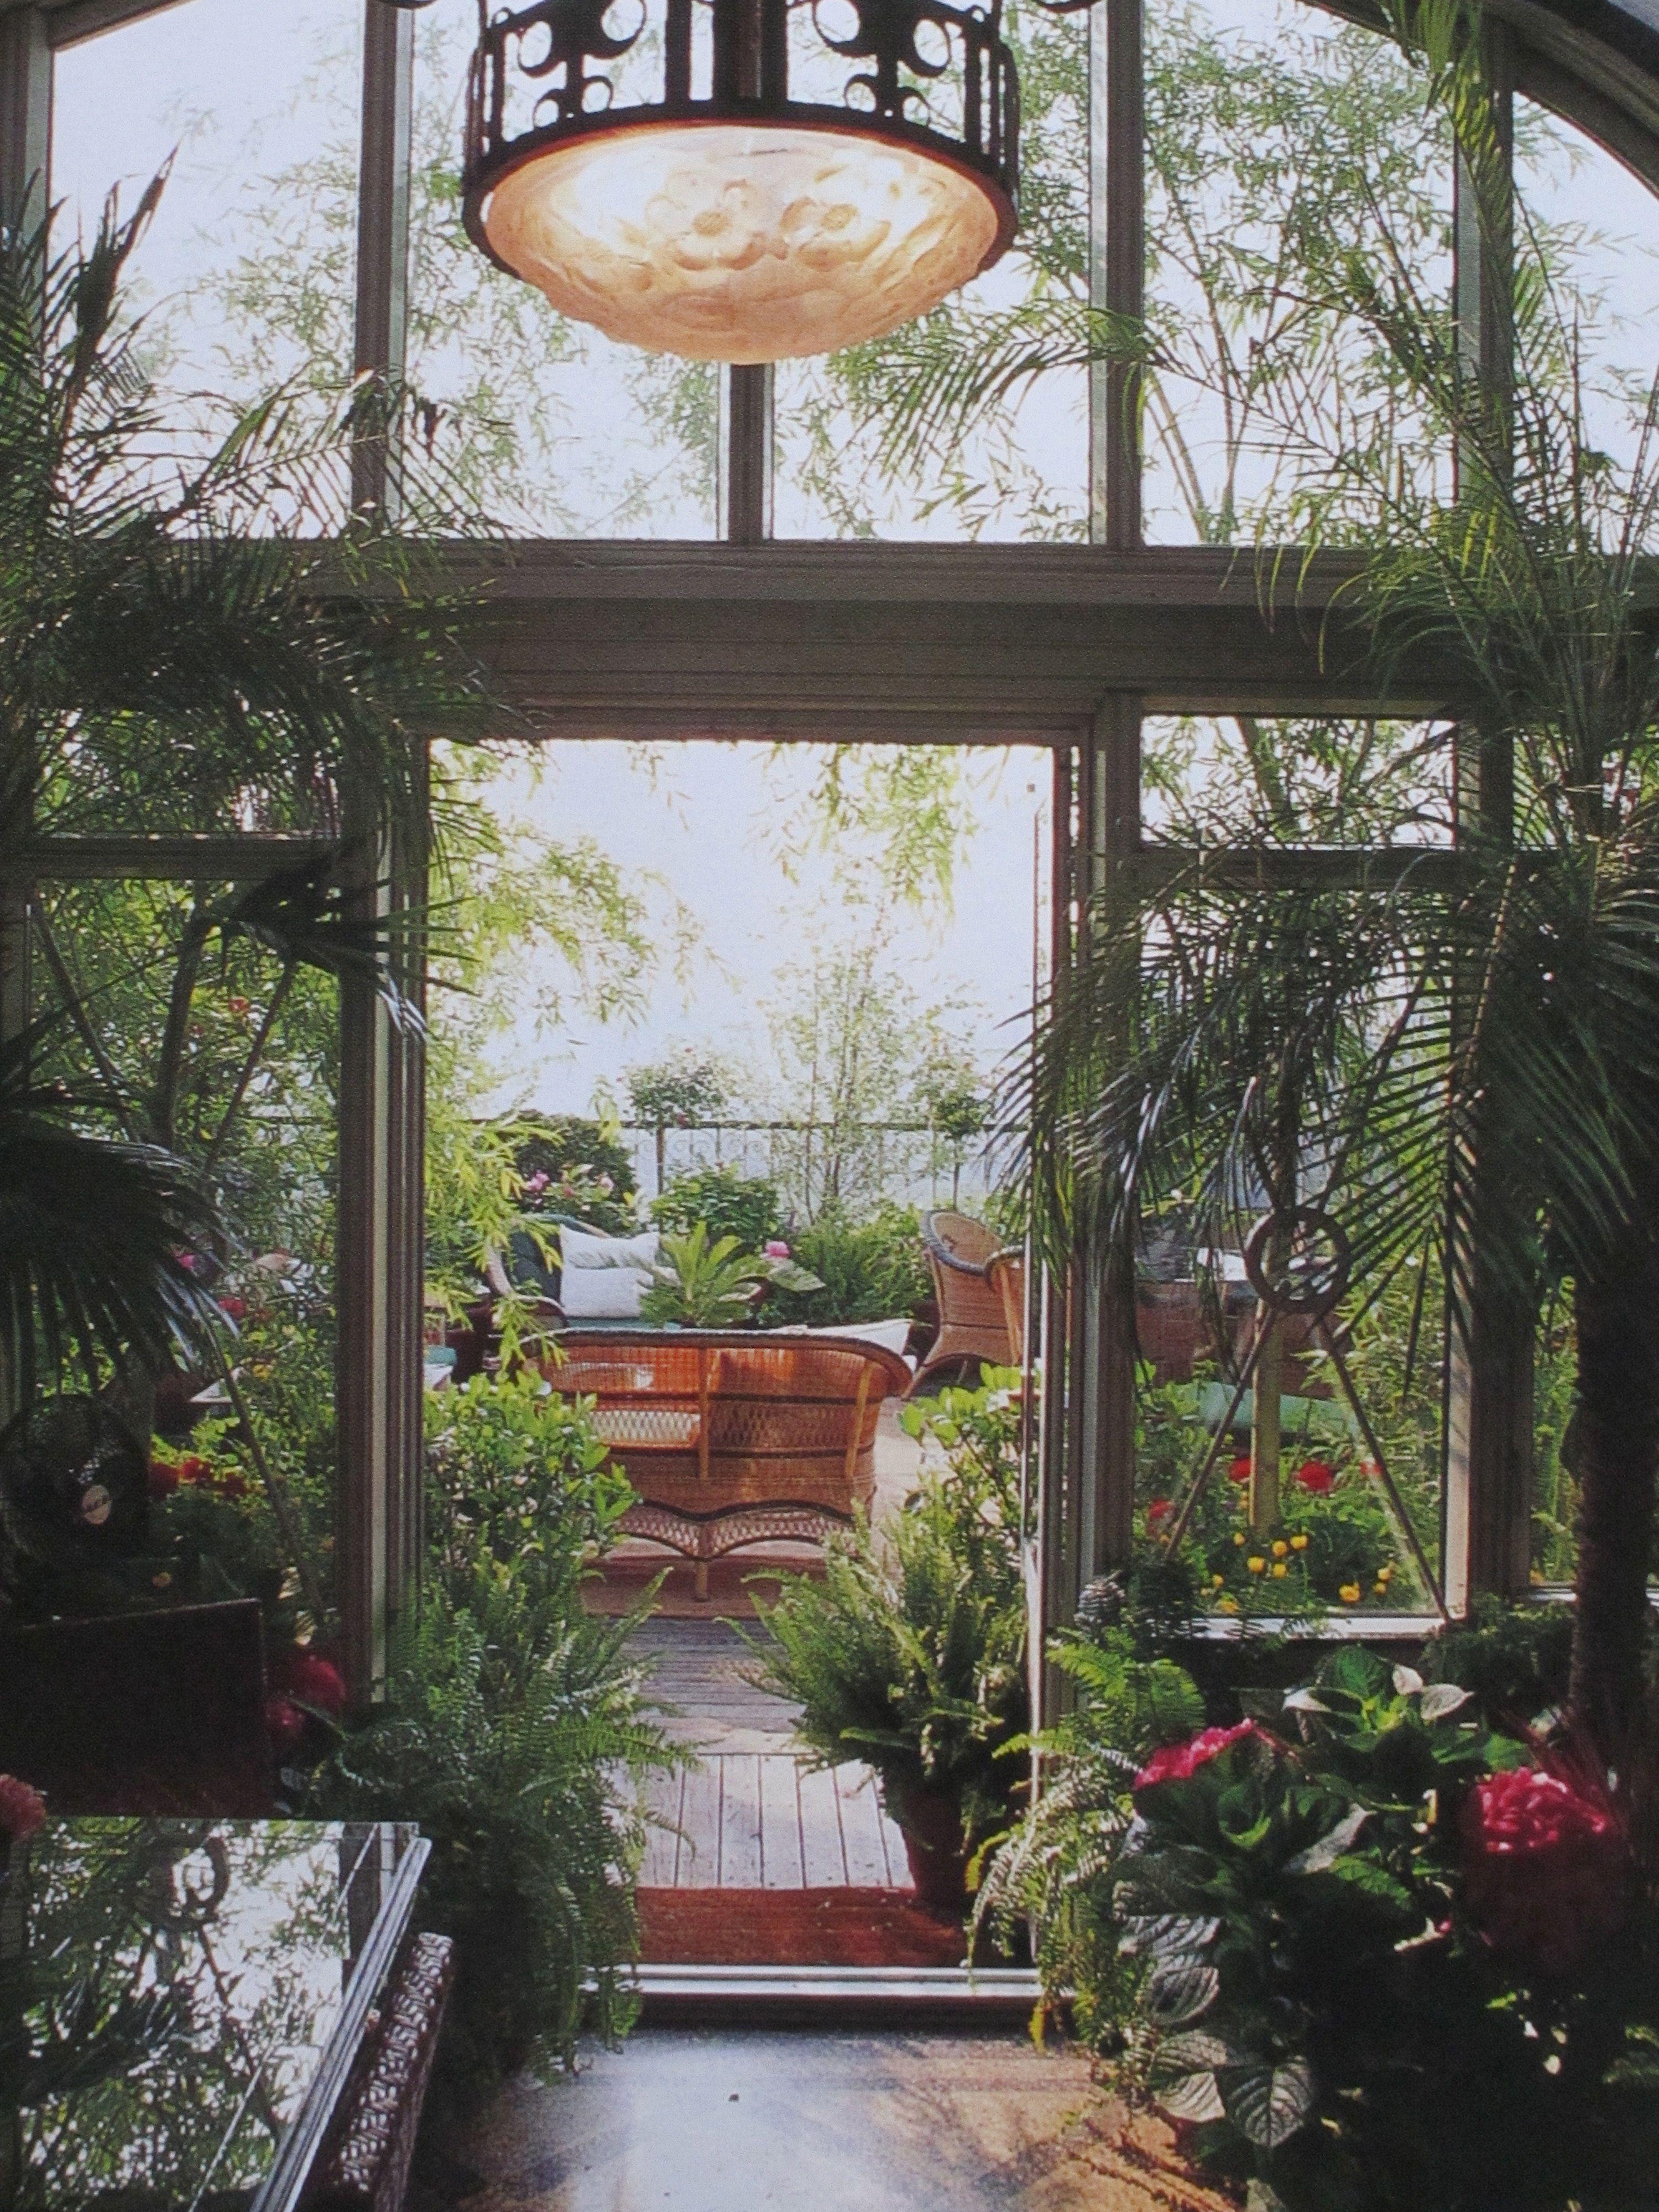 a look at the rooftop garden through the greenhouse door